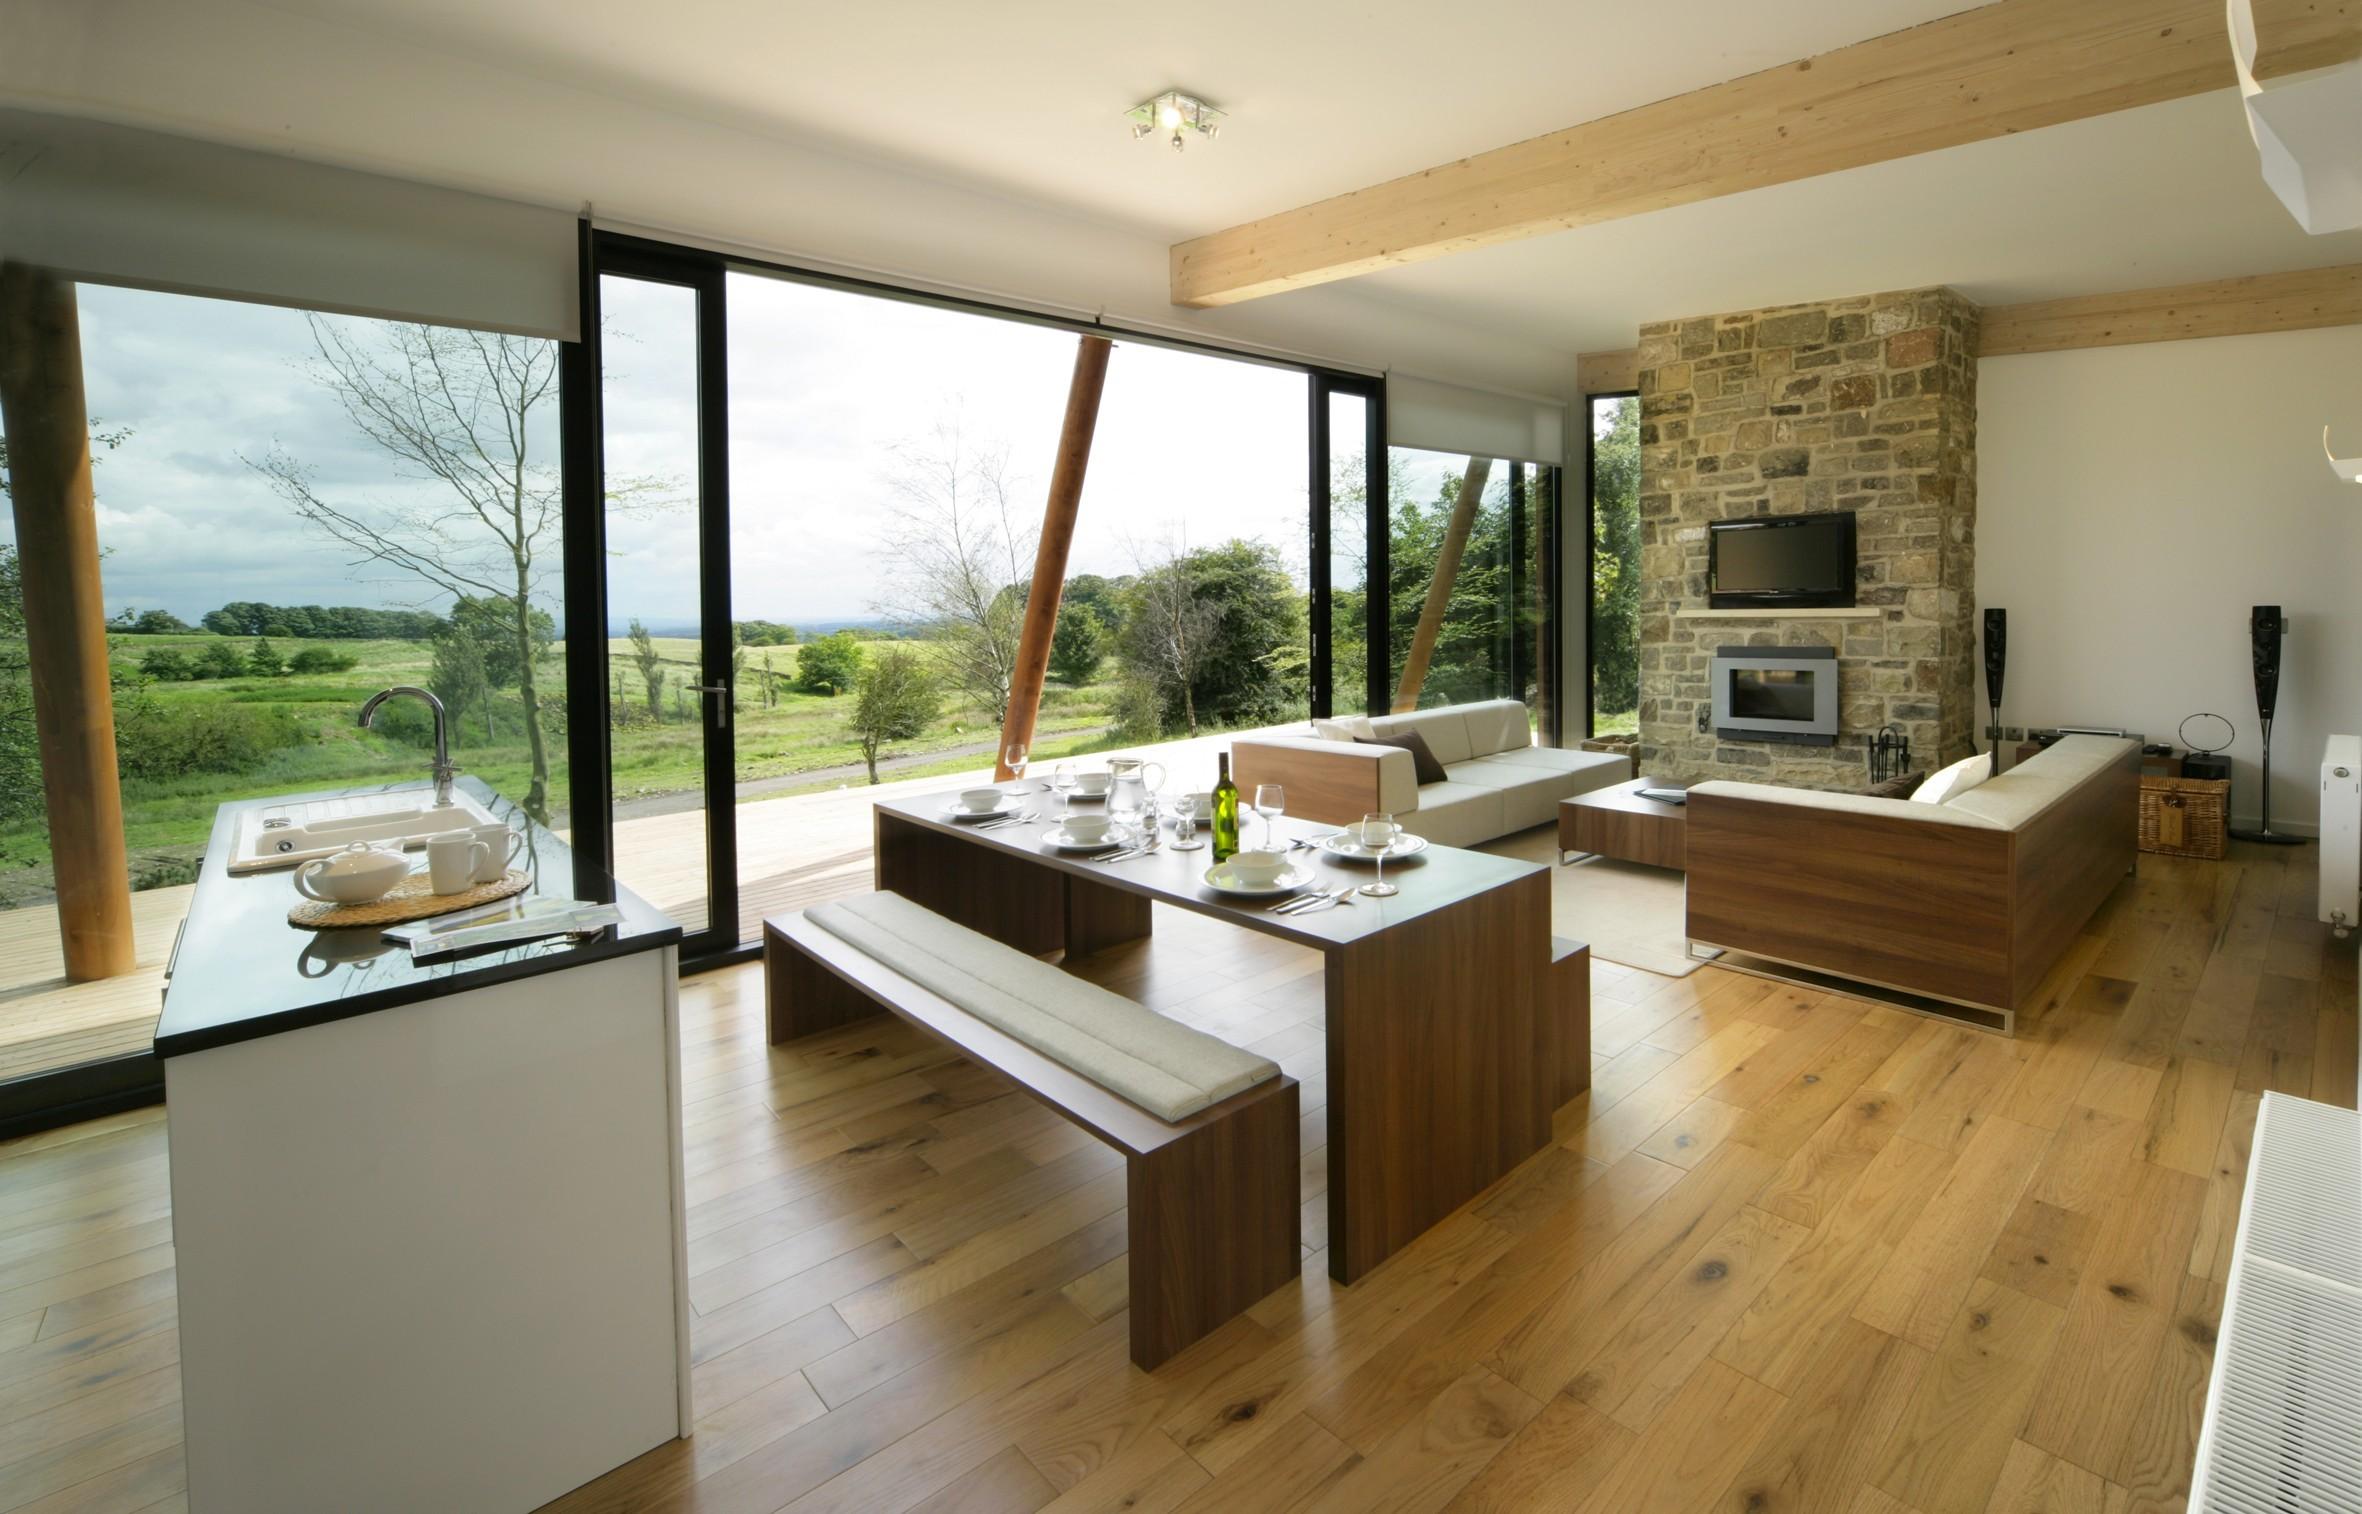 Kitchen island dining set – Kitchen ideas